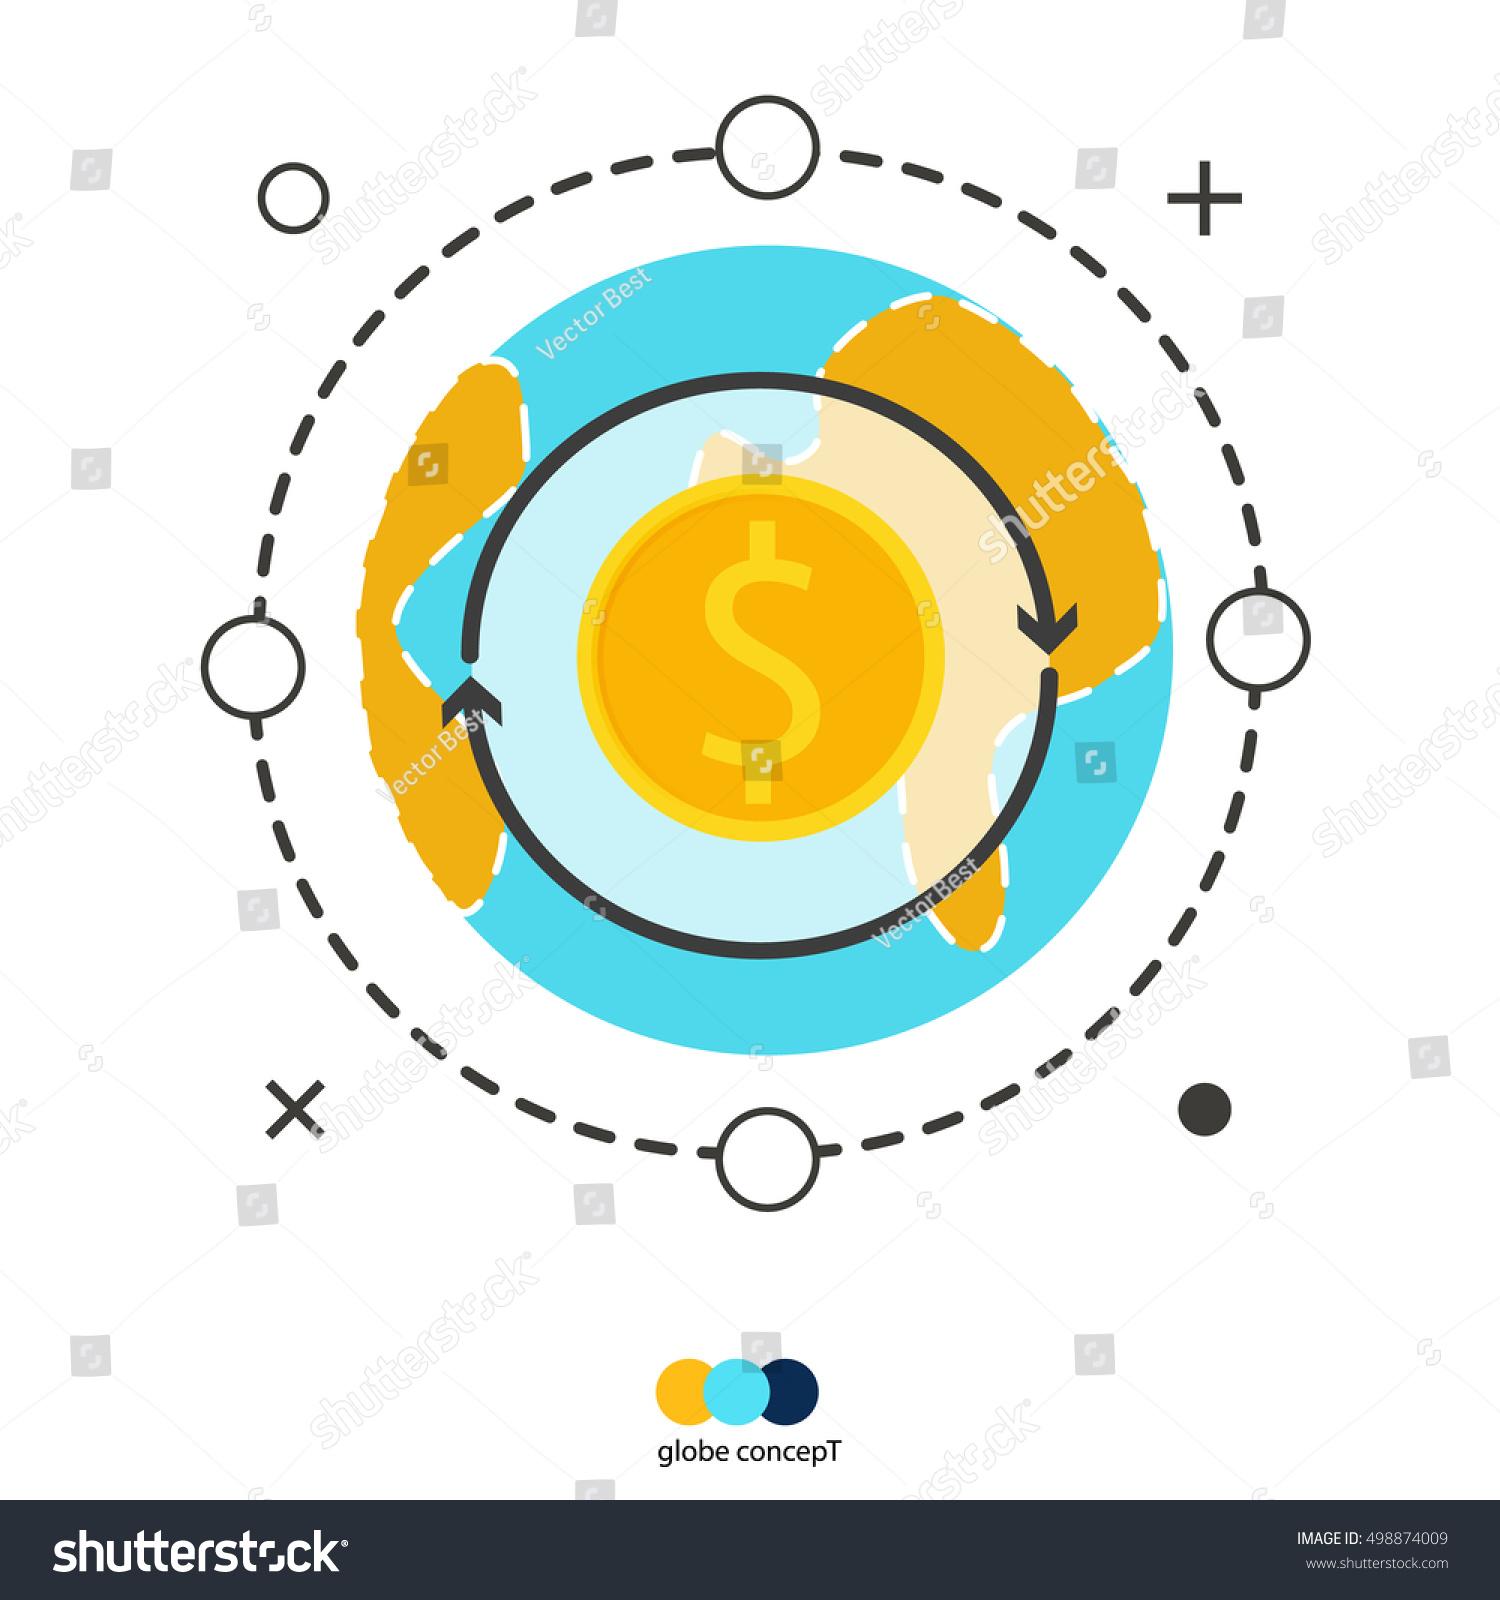 Globe concept money exchange currency world stock vector 498874009 globe concept of money exchange currency world converting money with dollar symbols global trading on buycottarizona Gallery